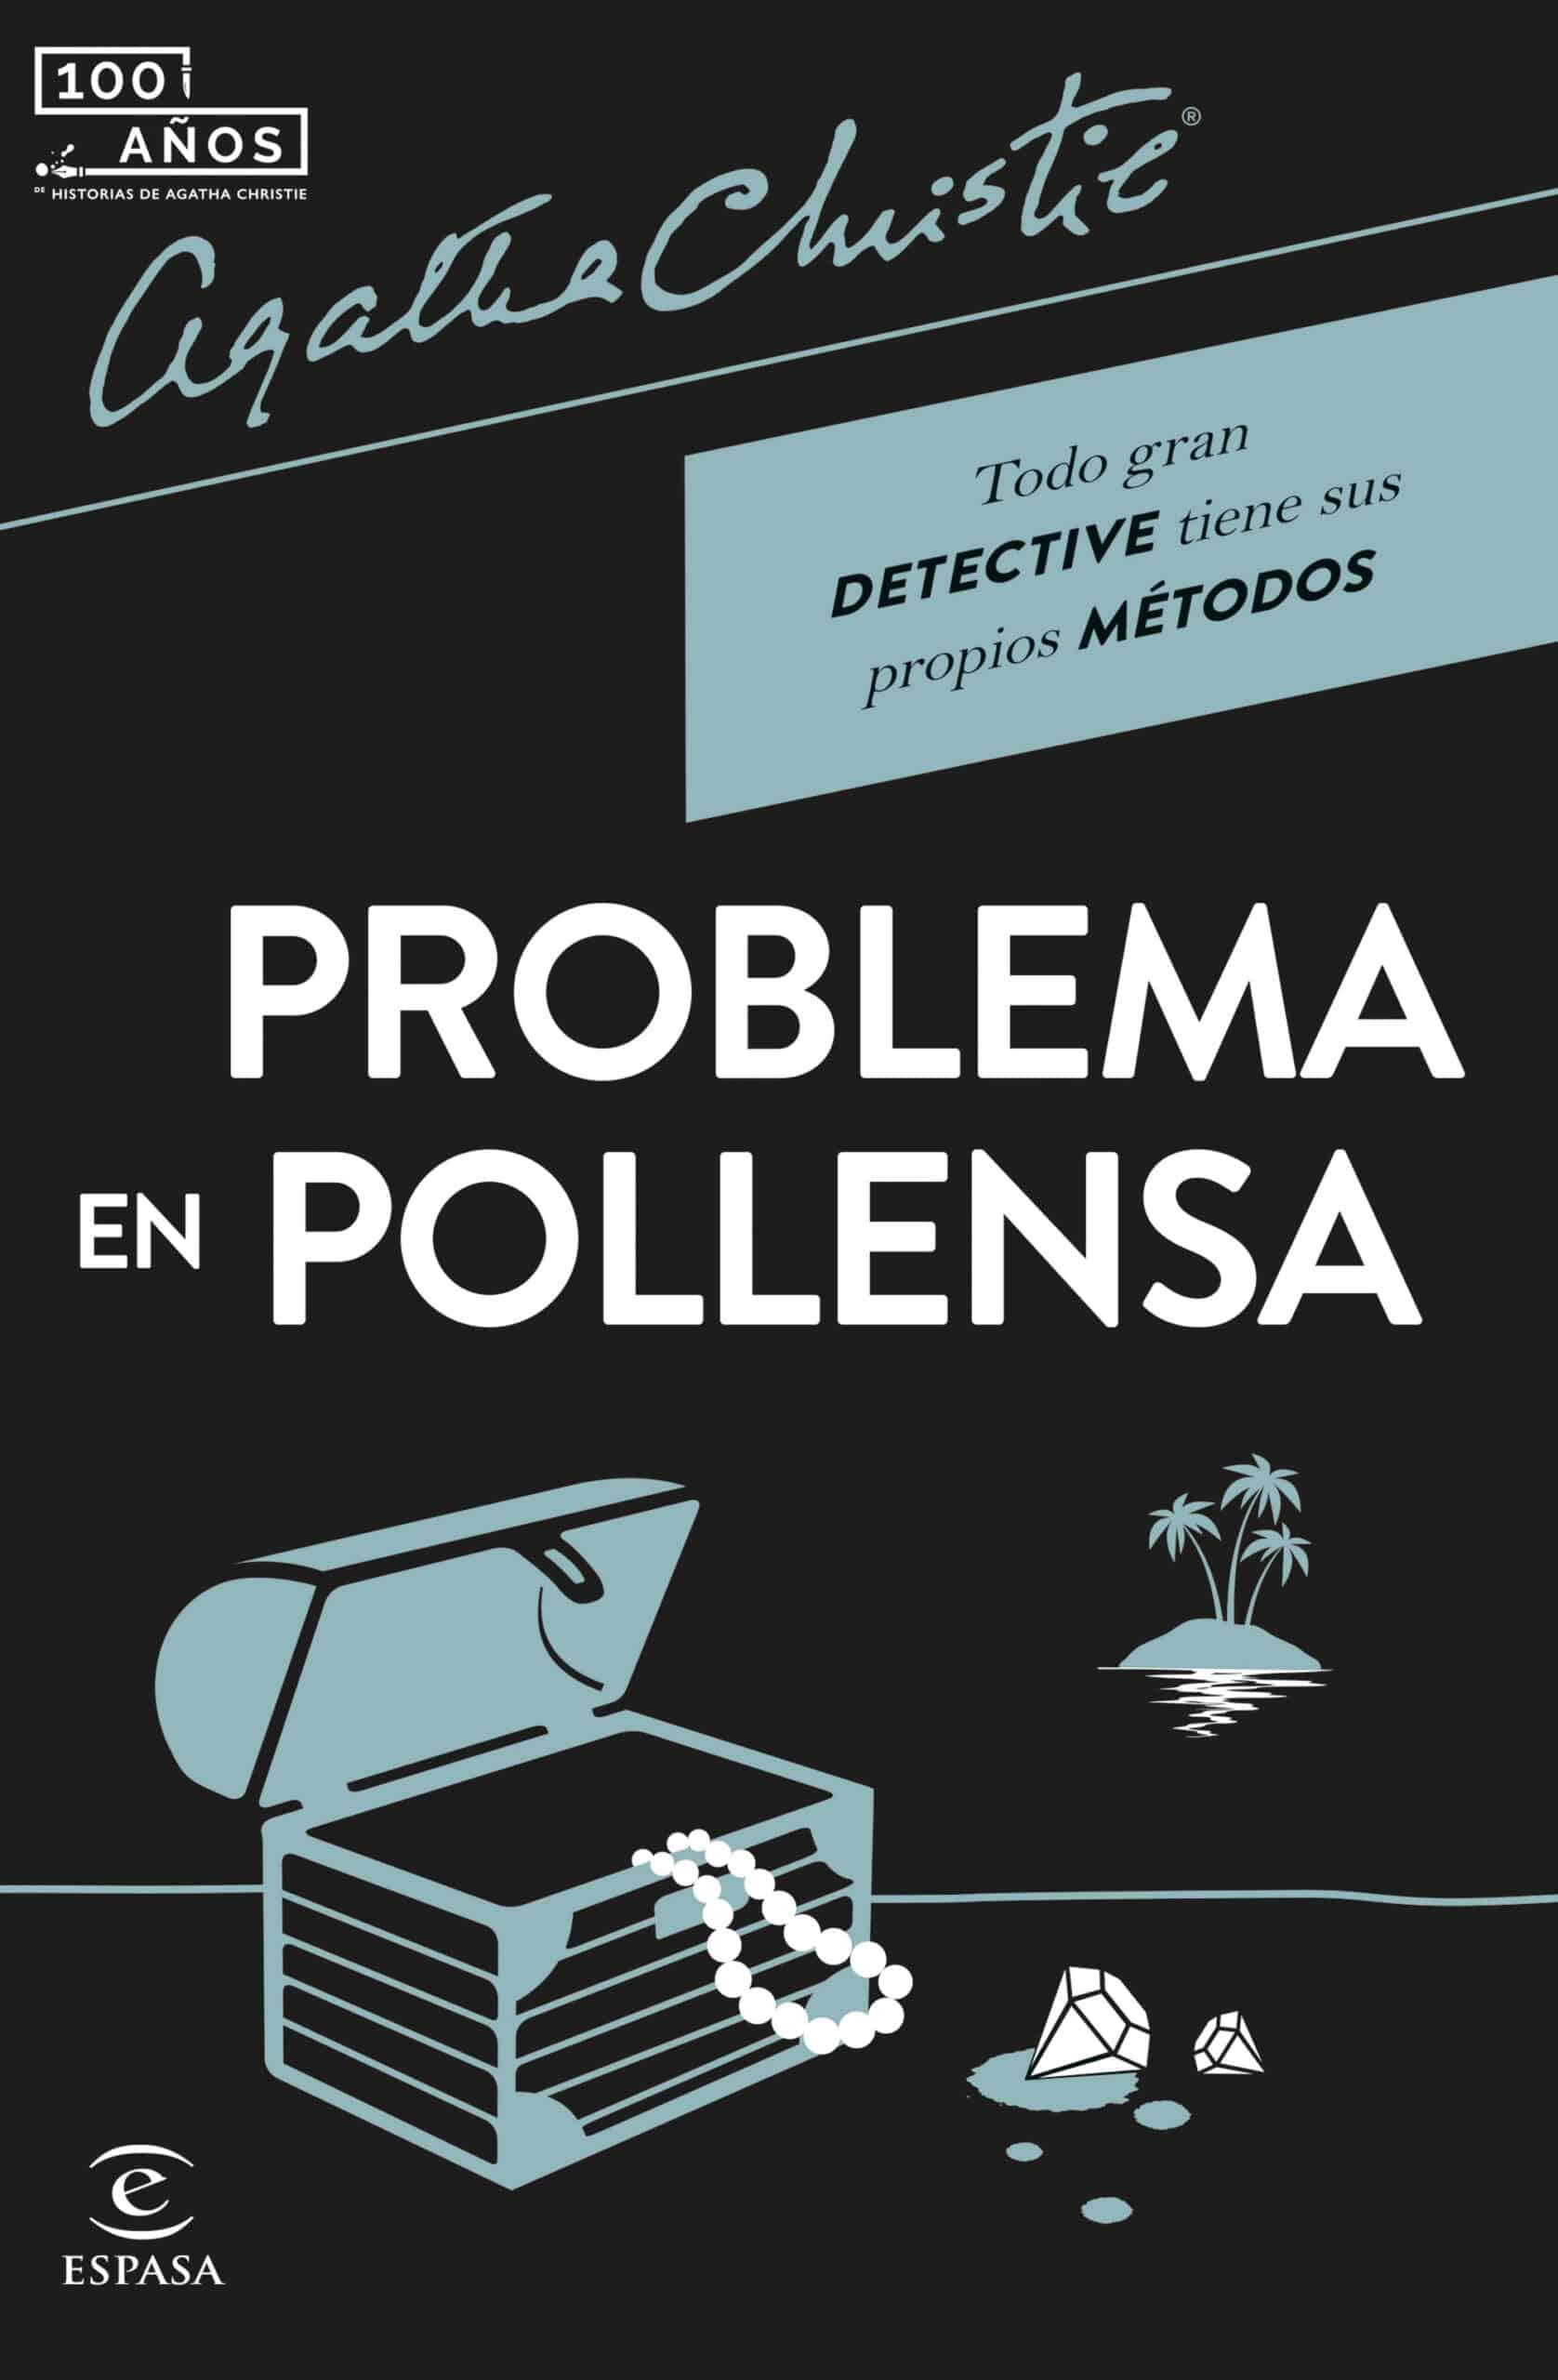 La novela que surgió tras la visita de Agatha Christie a Mallorca